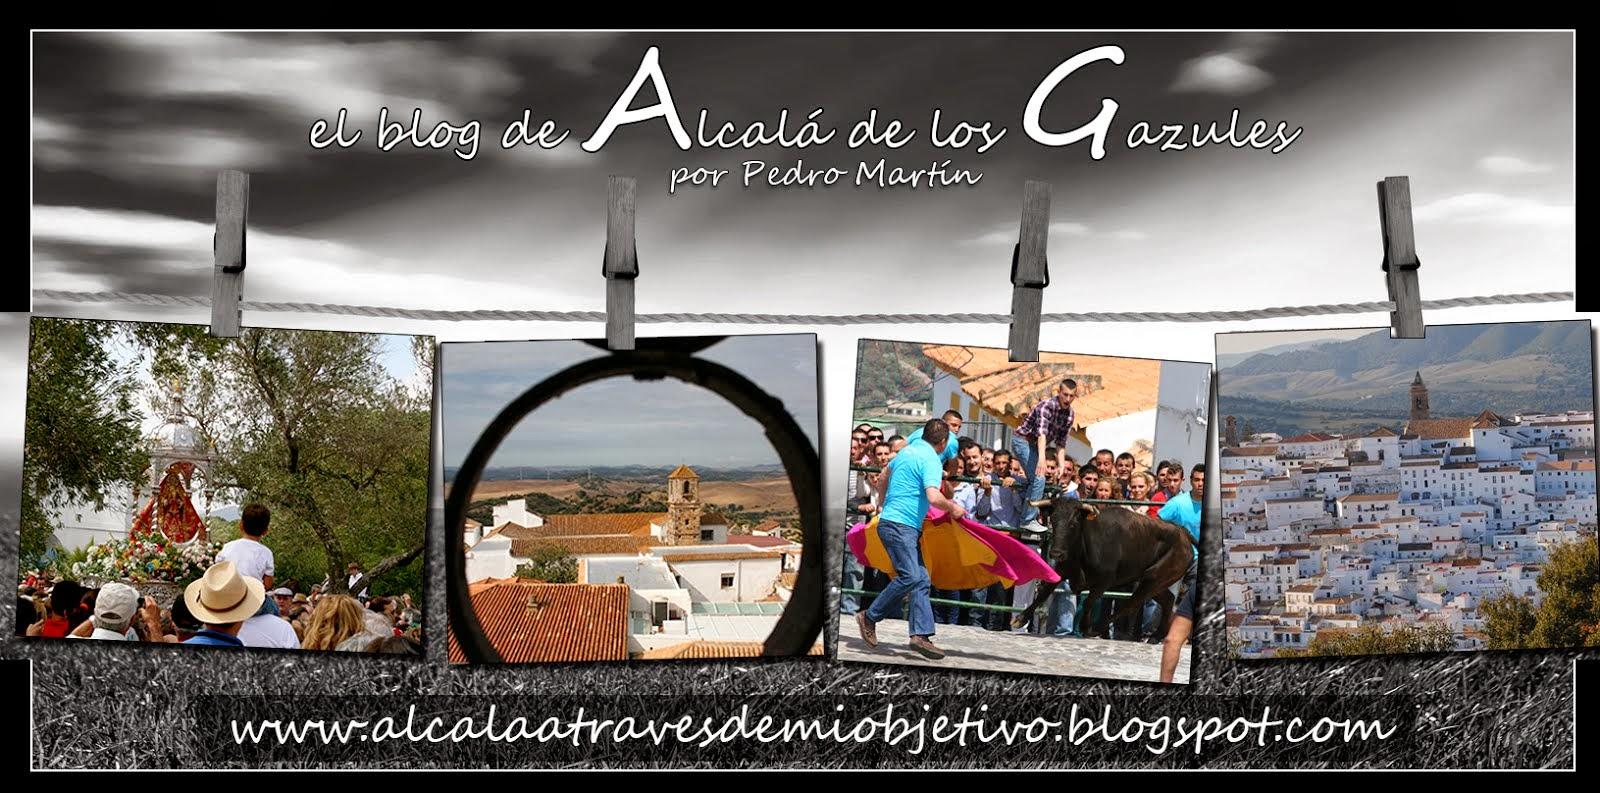 www.alcalaatravesdemiobjetivo.blogspot.com